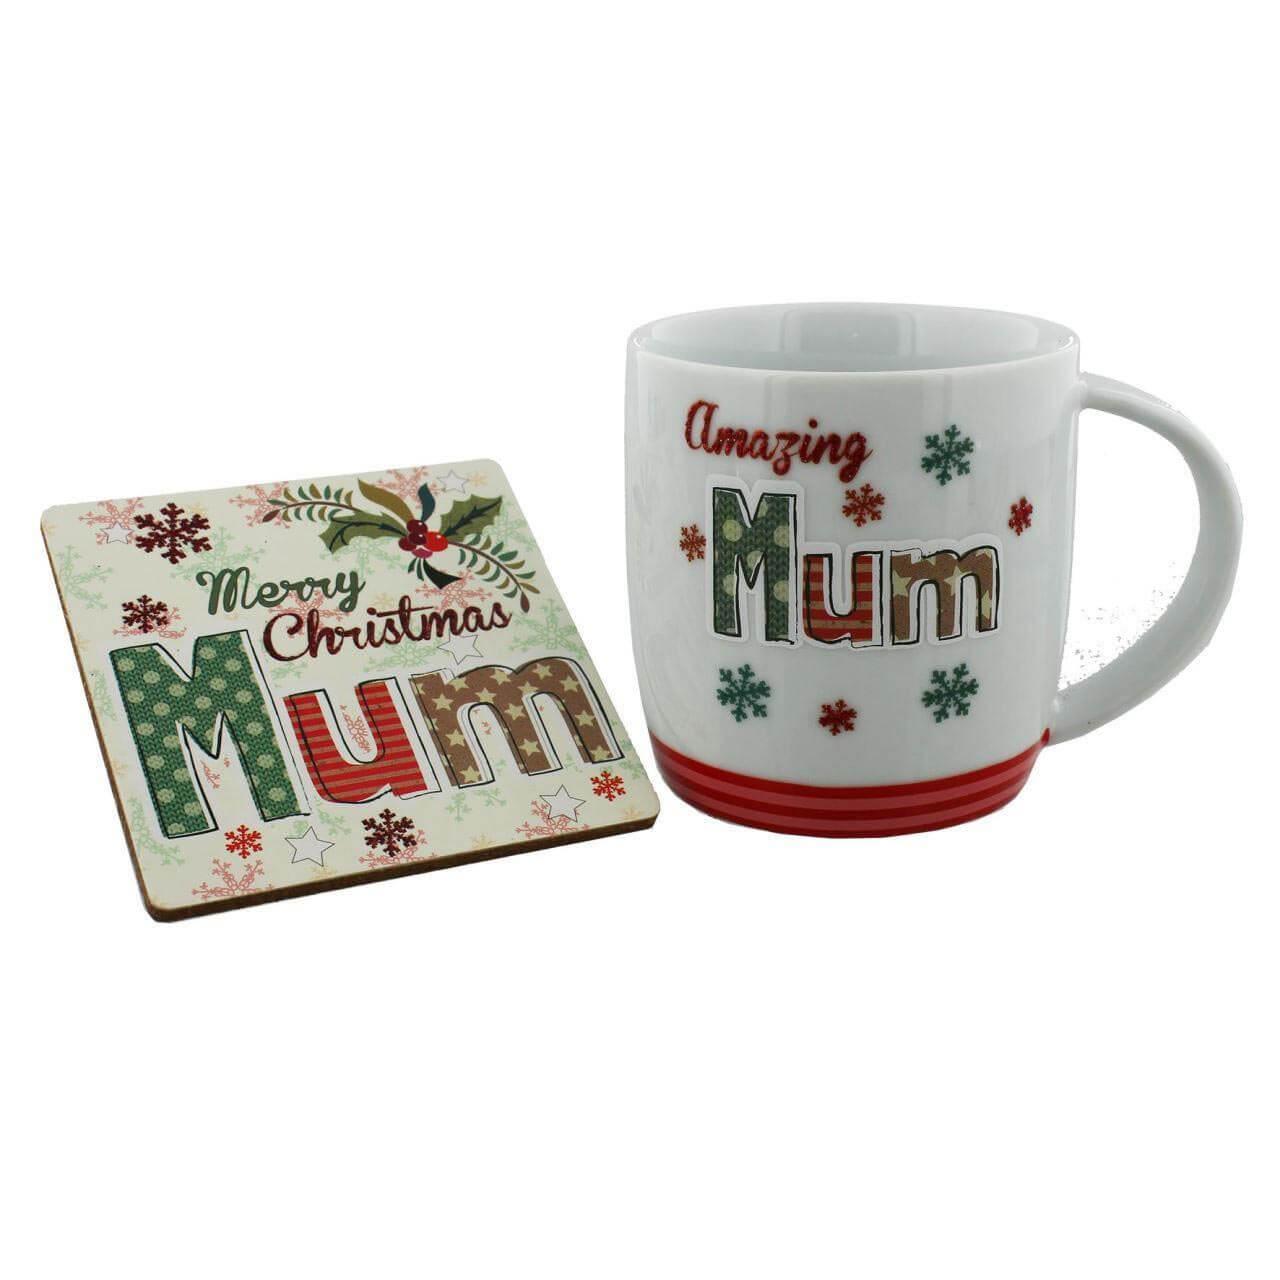 Set cadou pentru Craciun Amazing Mum